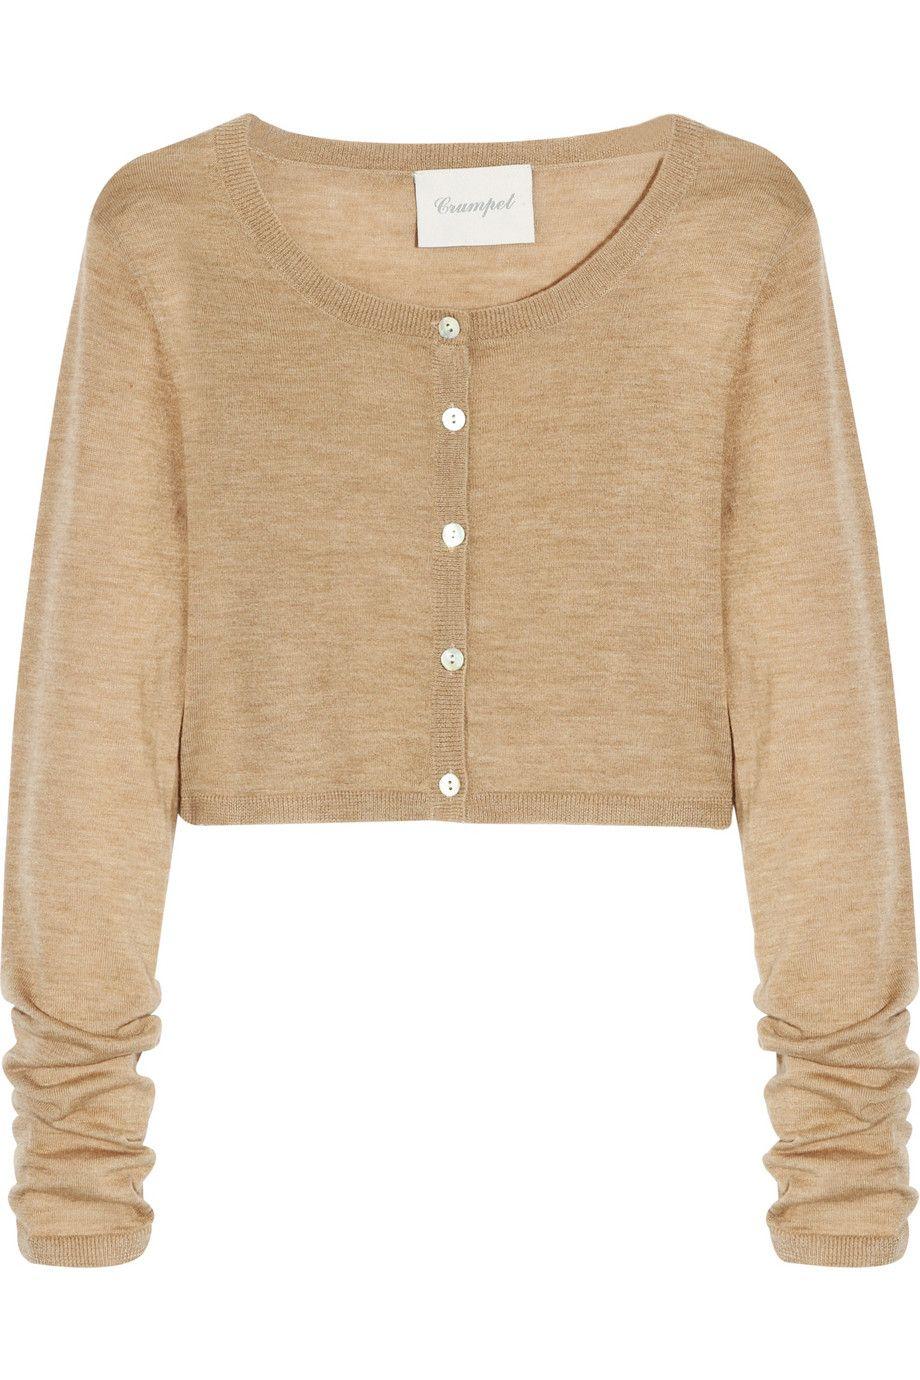 Crumpet | Cropped fine-knit cashmere cardigan | NET-A-PORTER.COM ...